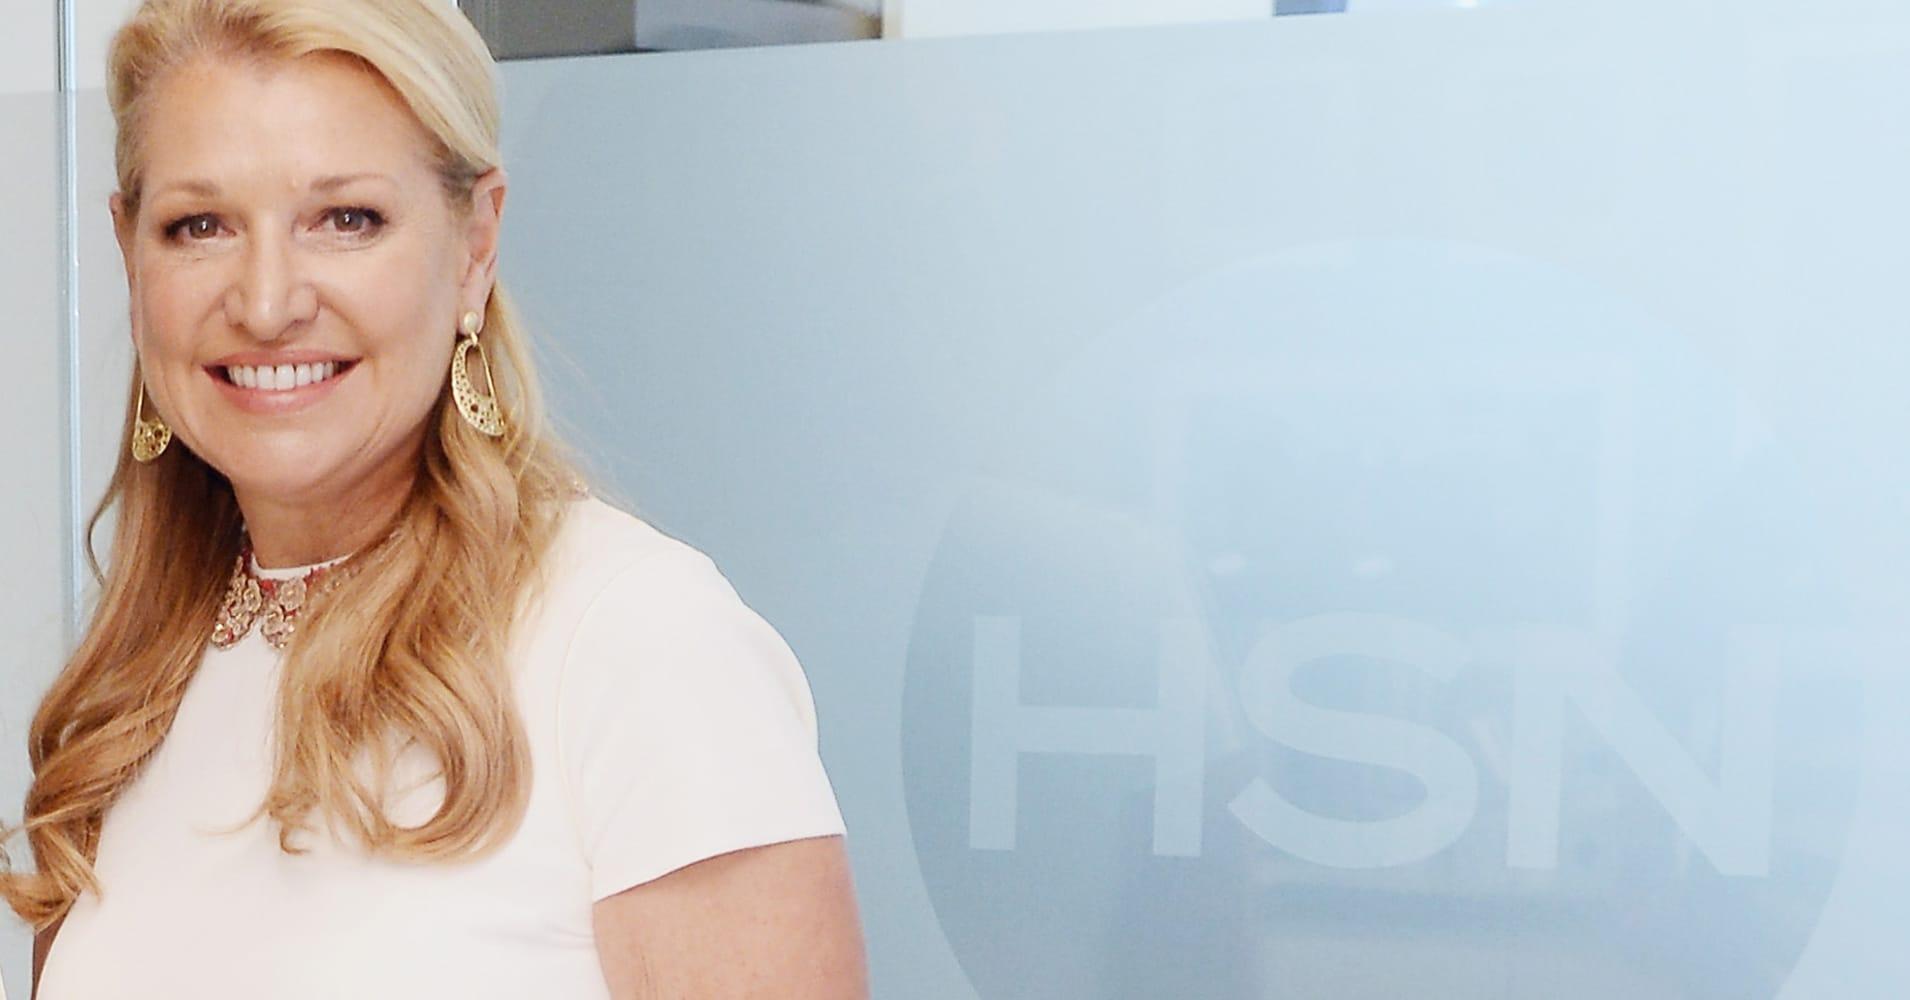 HSNi CEO Mindy Grossman